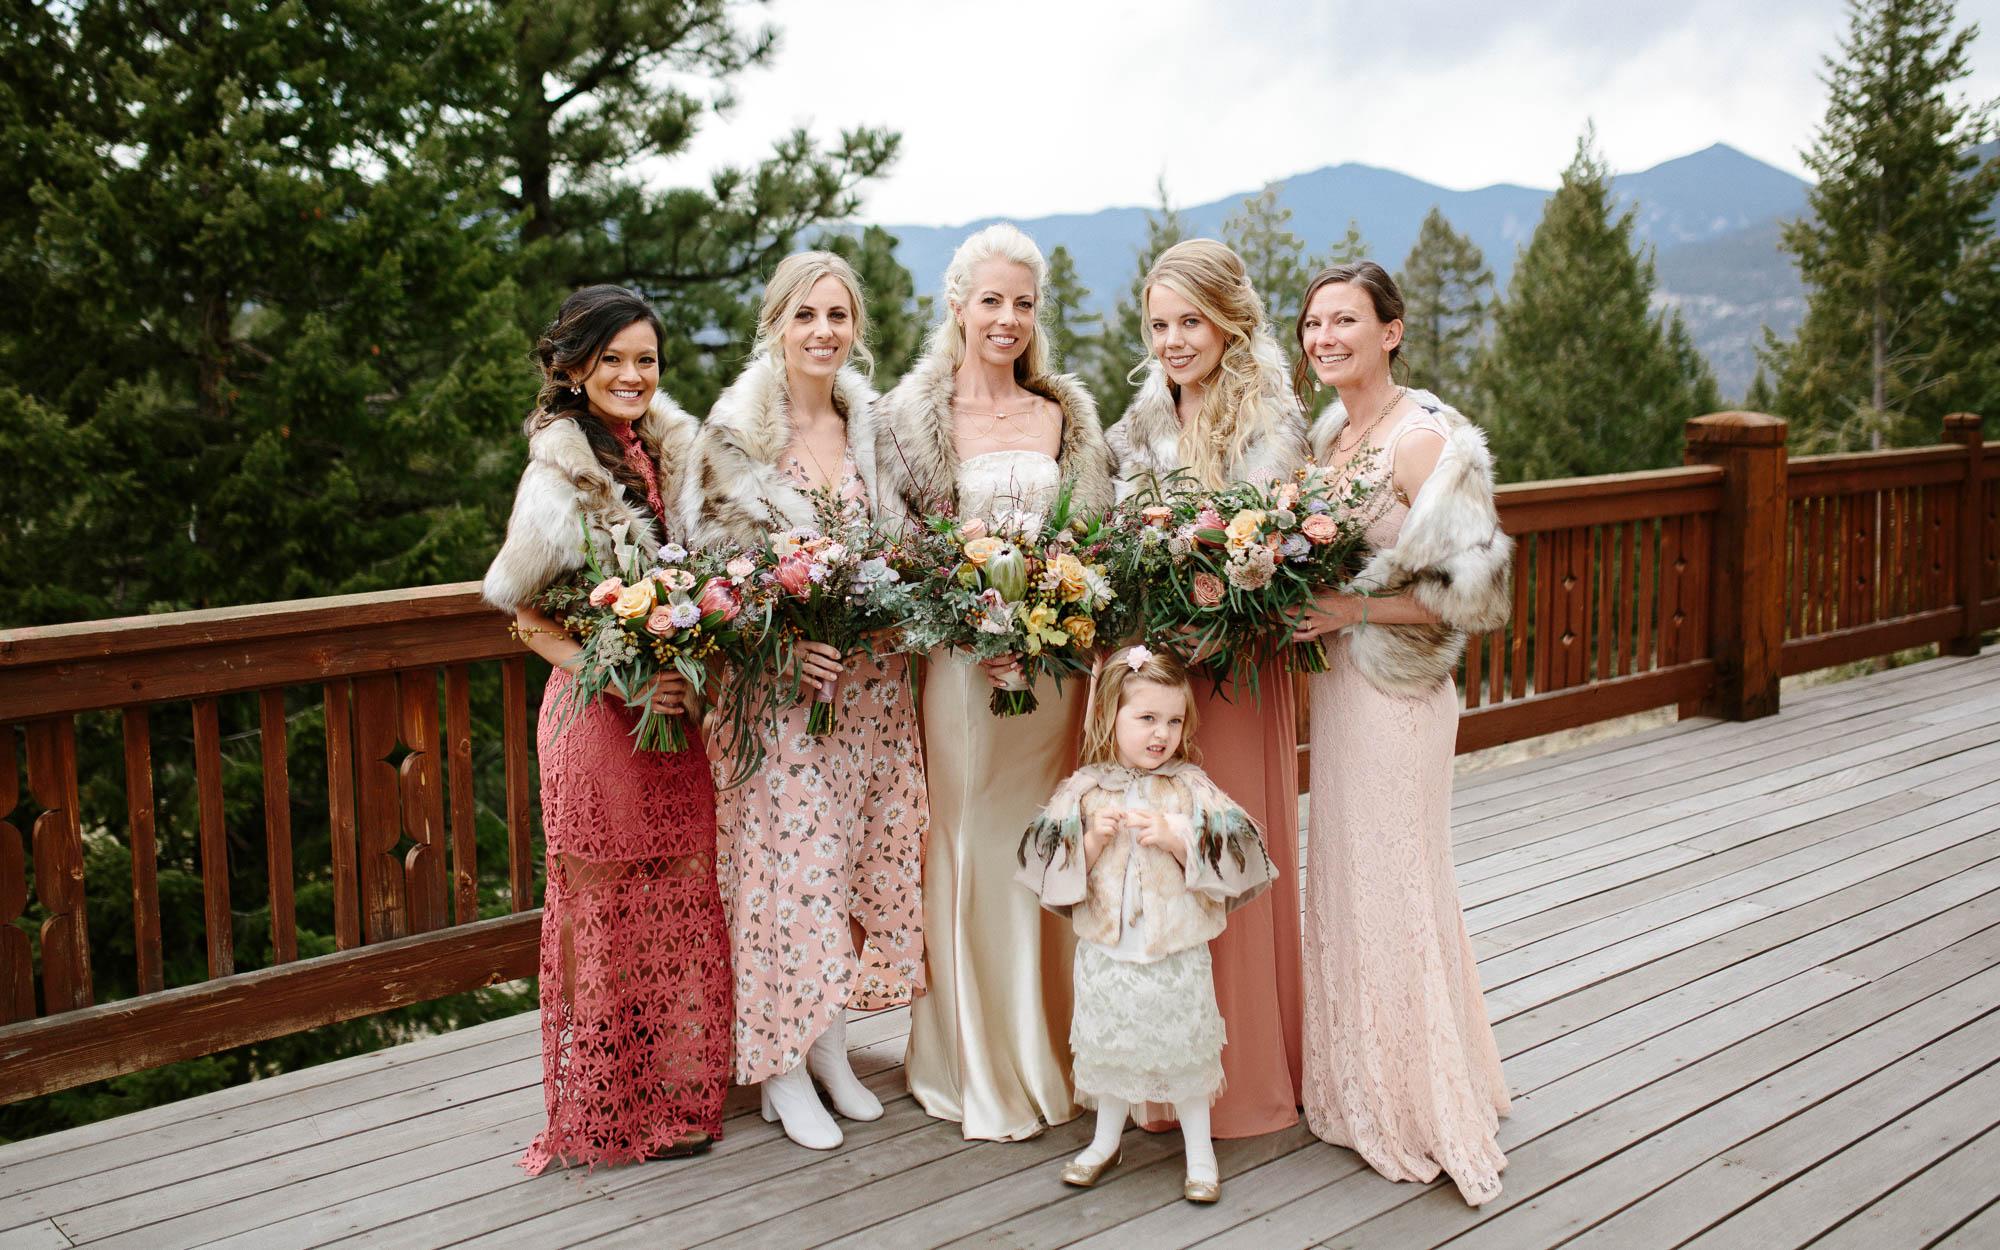 bucci-barn-wedding-elopement-evergreen-boulder-denver-colorado-adventerous-romantic-timeless-041.jpg